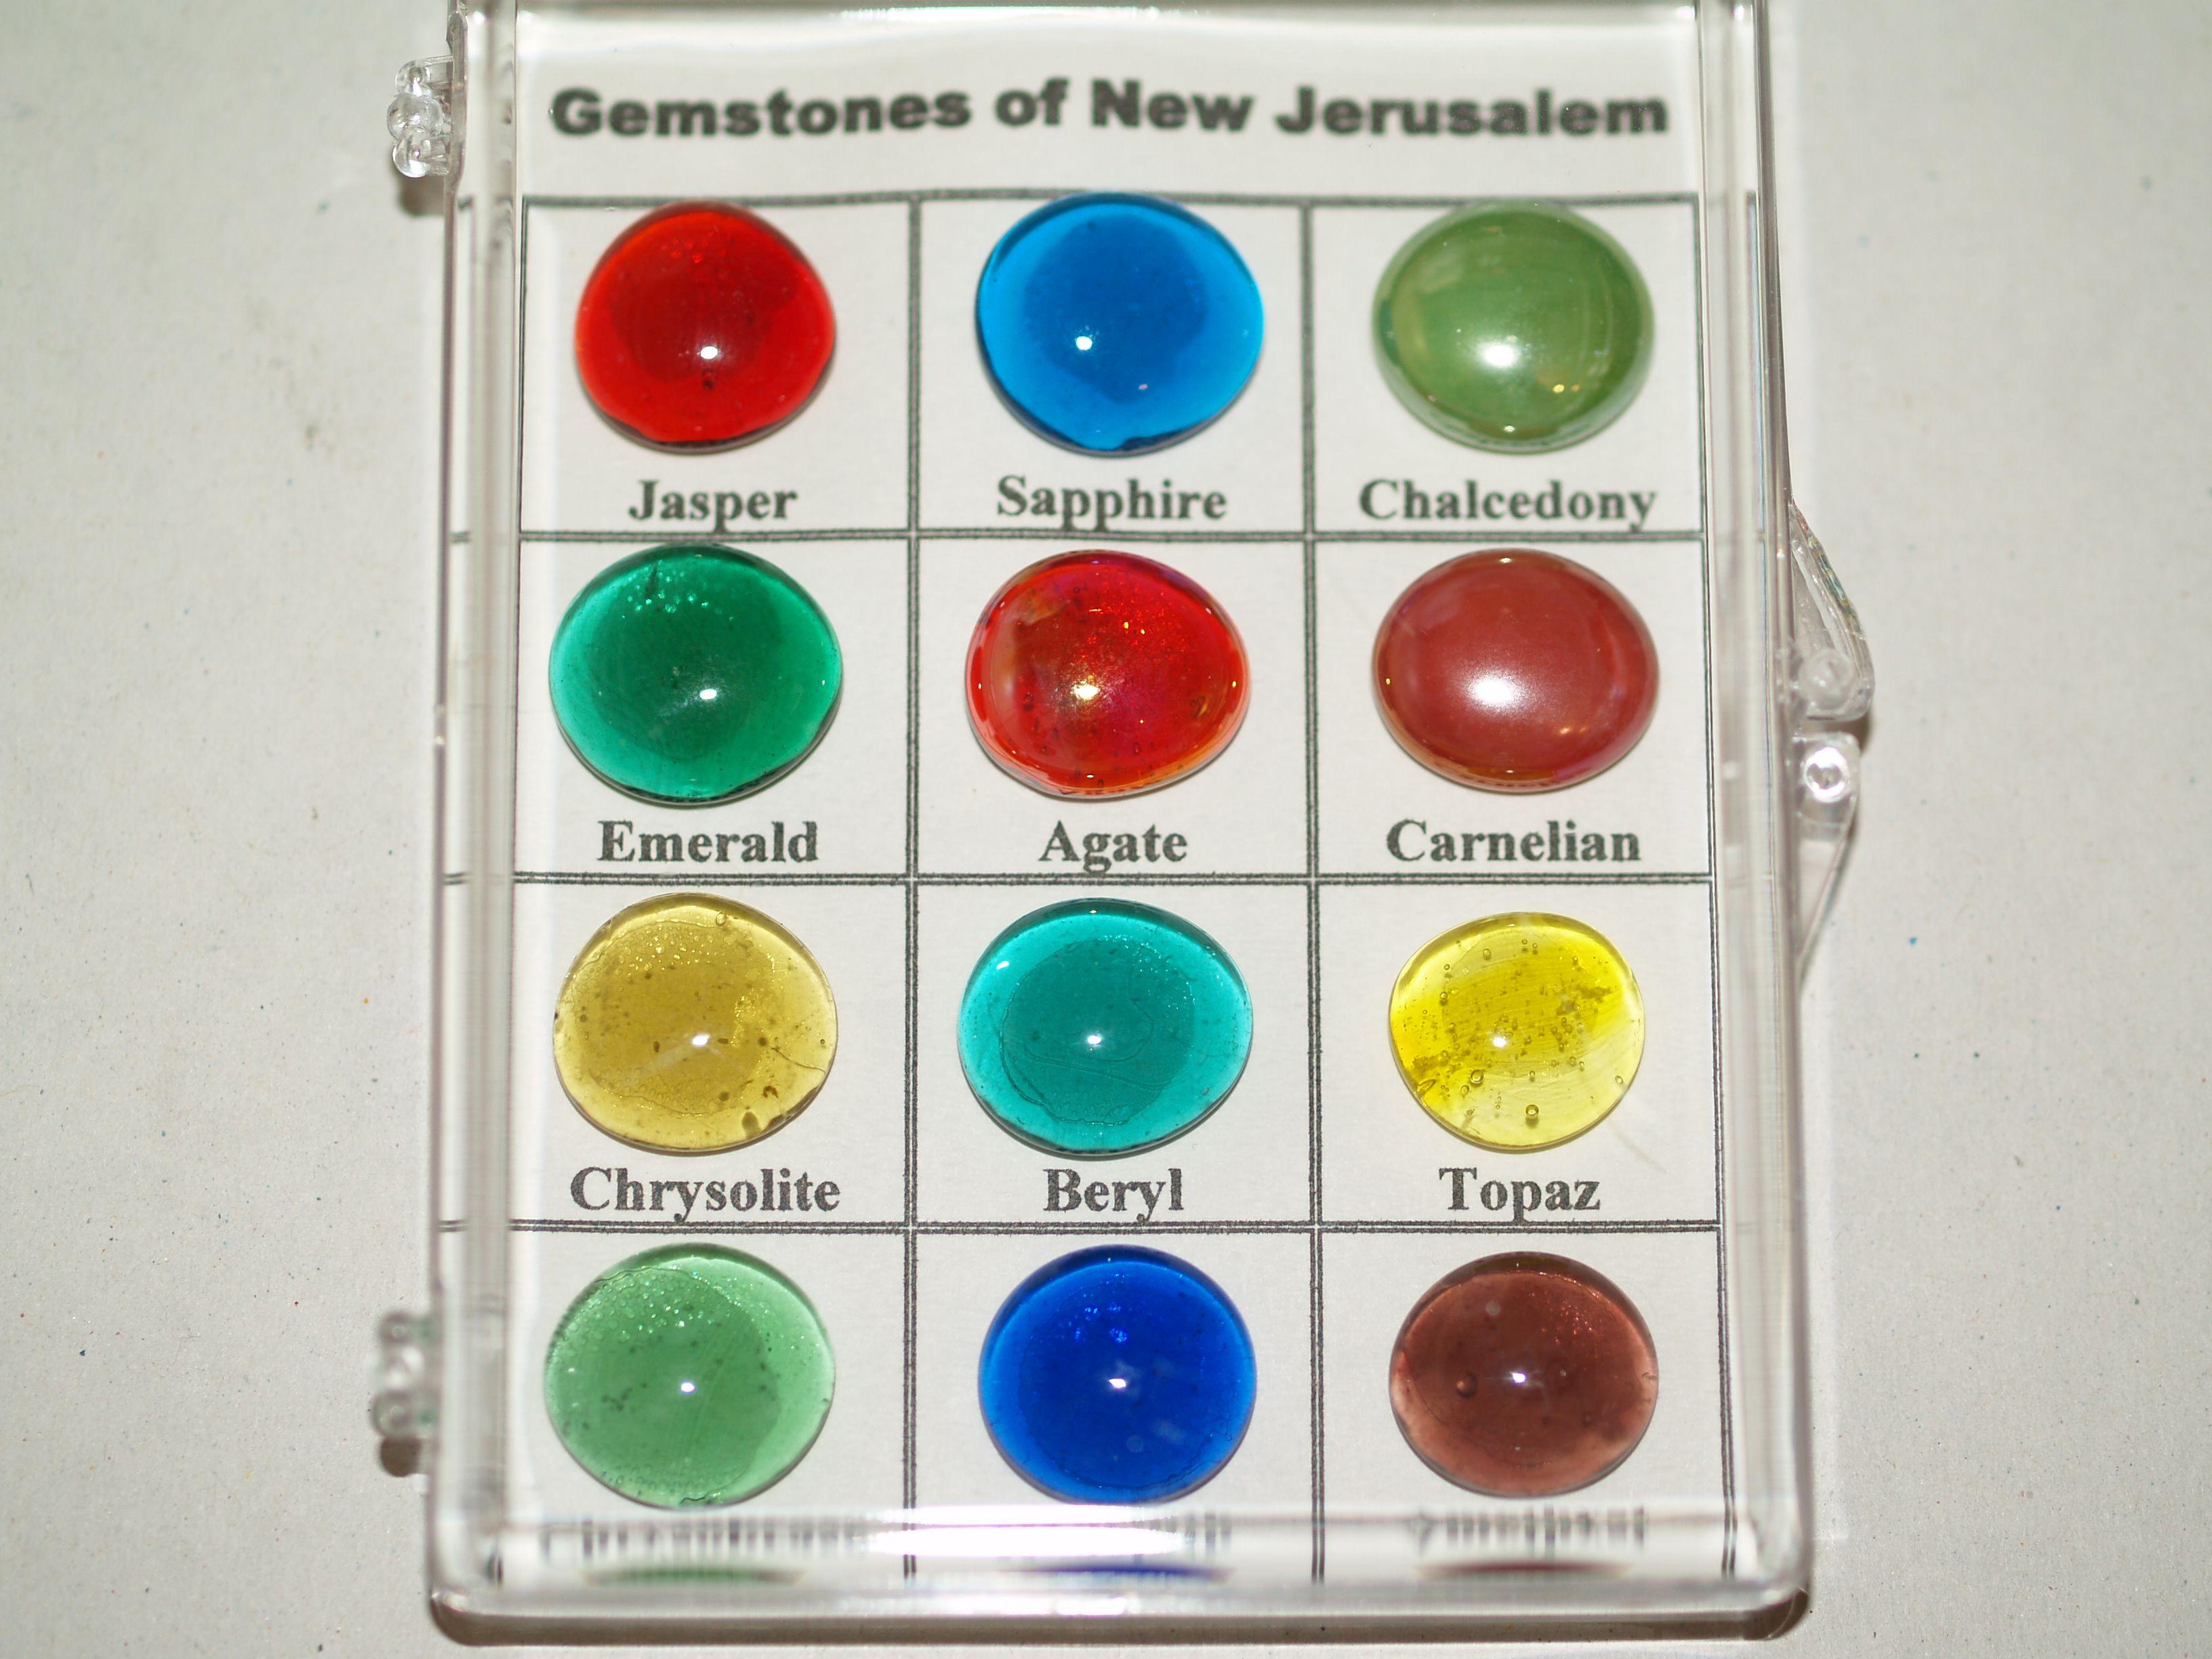 Gemstones Of New Jerusalem Simulated Stones 9 95 Zen Cart The Art Of E Commerce New Jerusalem Stone Gemstones